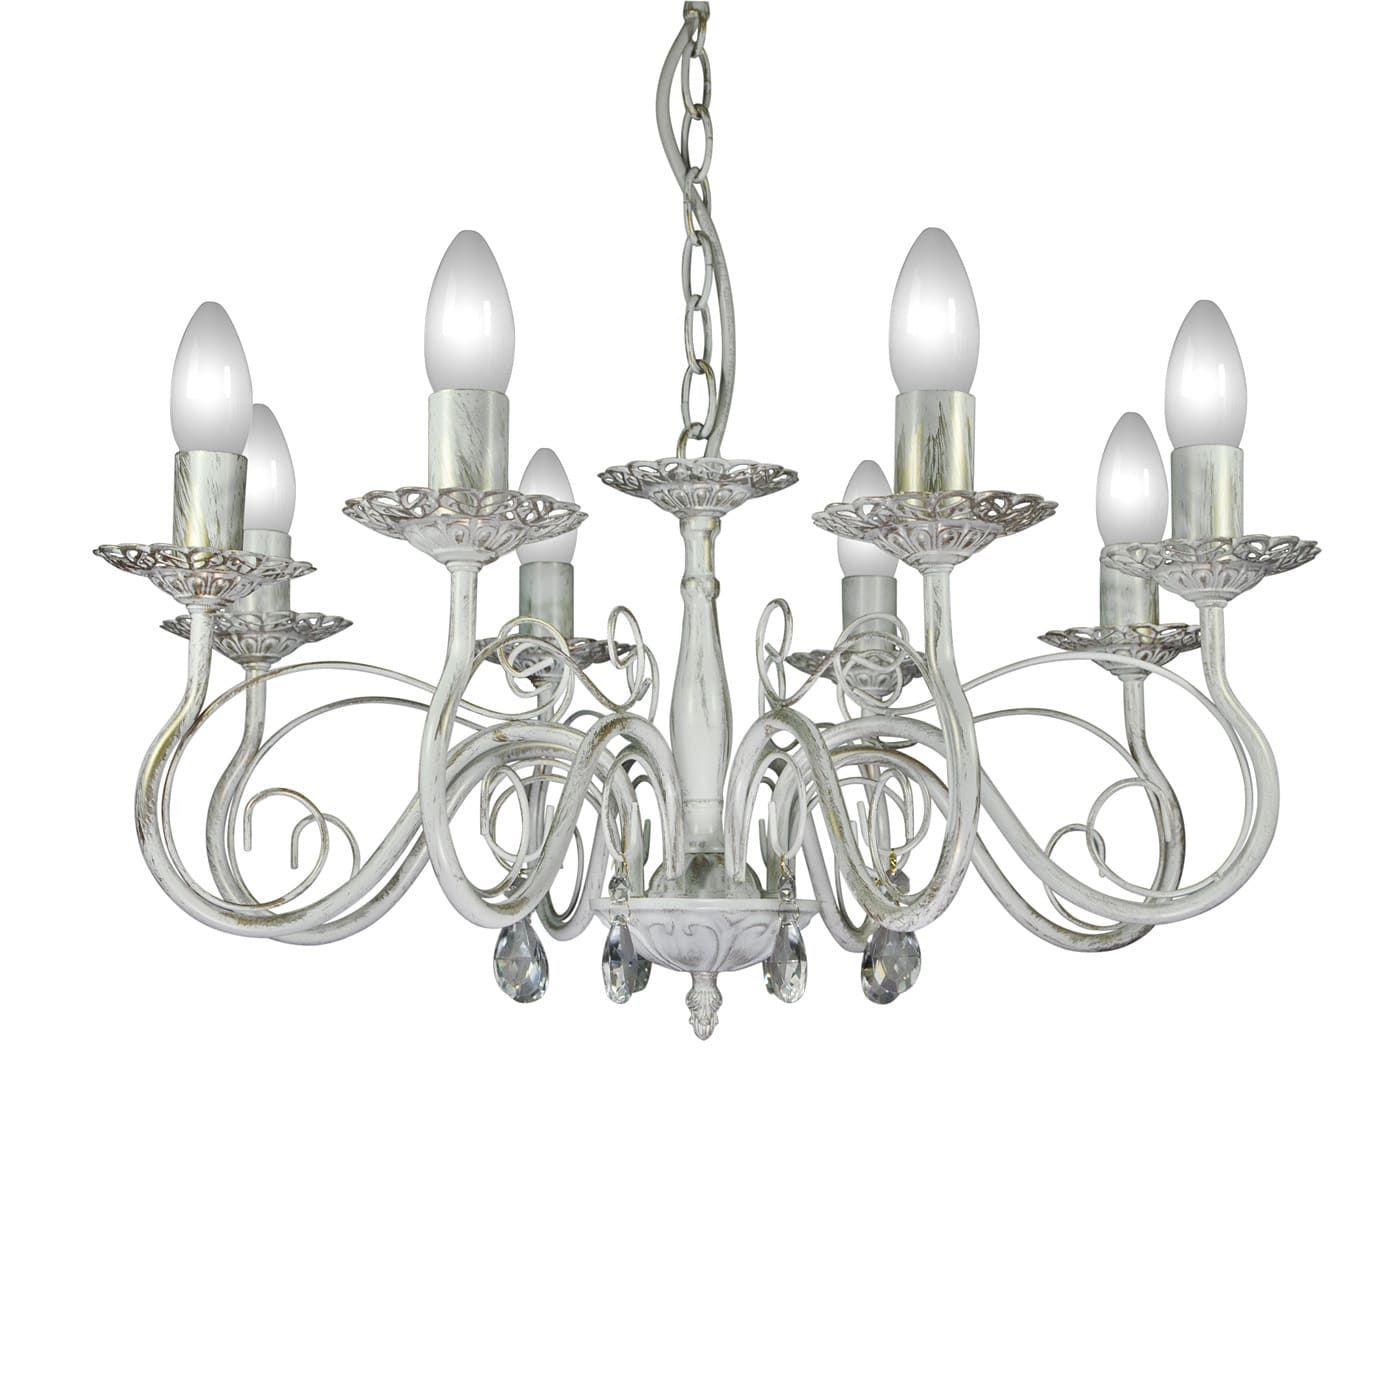 PETRASVET / Pendant chandelier S1164-8, 8xE14 max. 60W